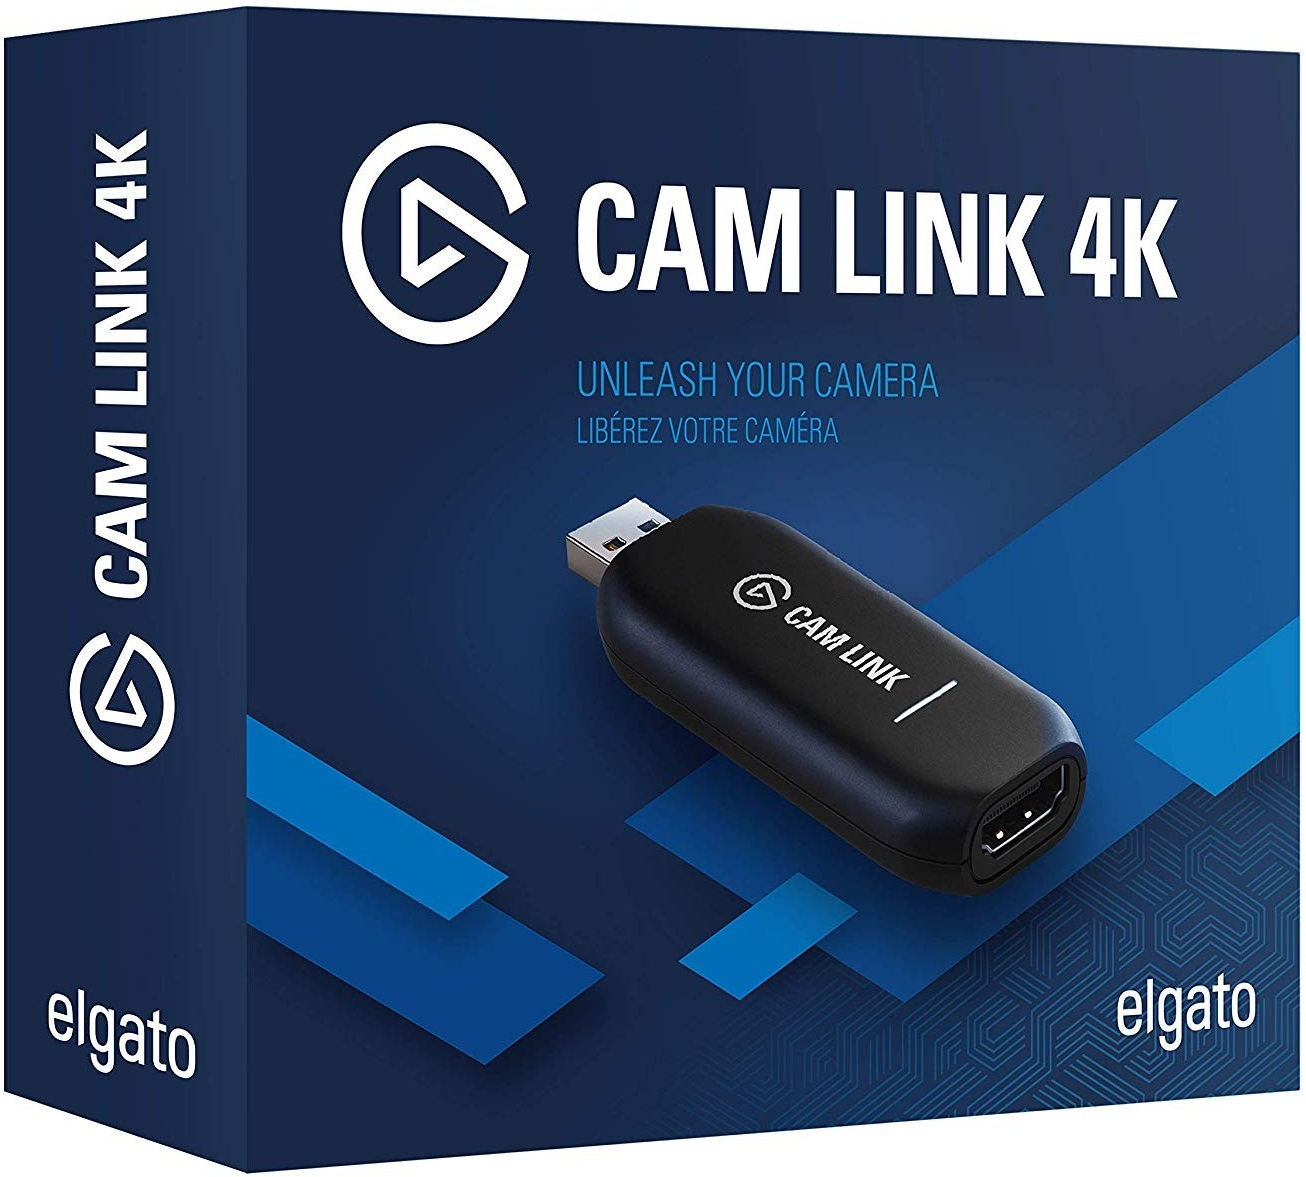 Elgato Cam Link 4K image